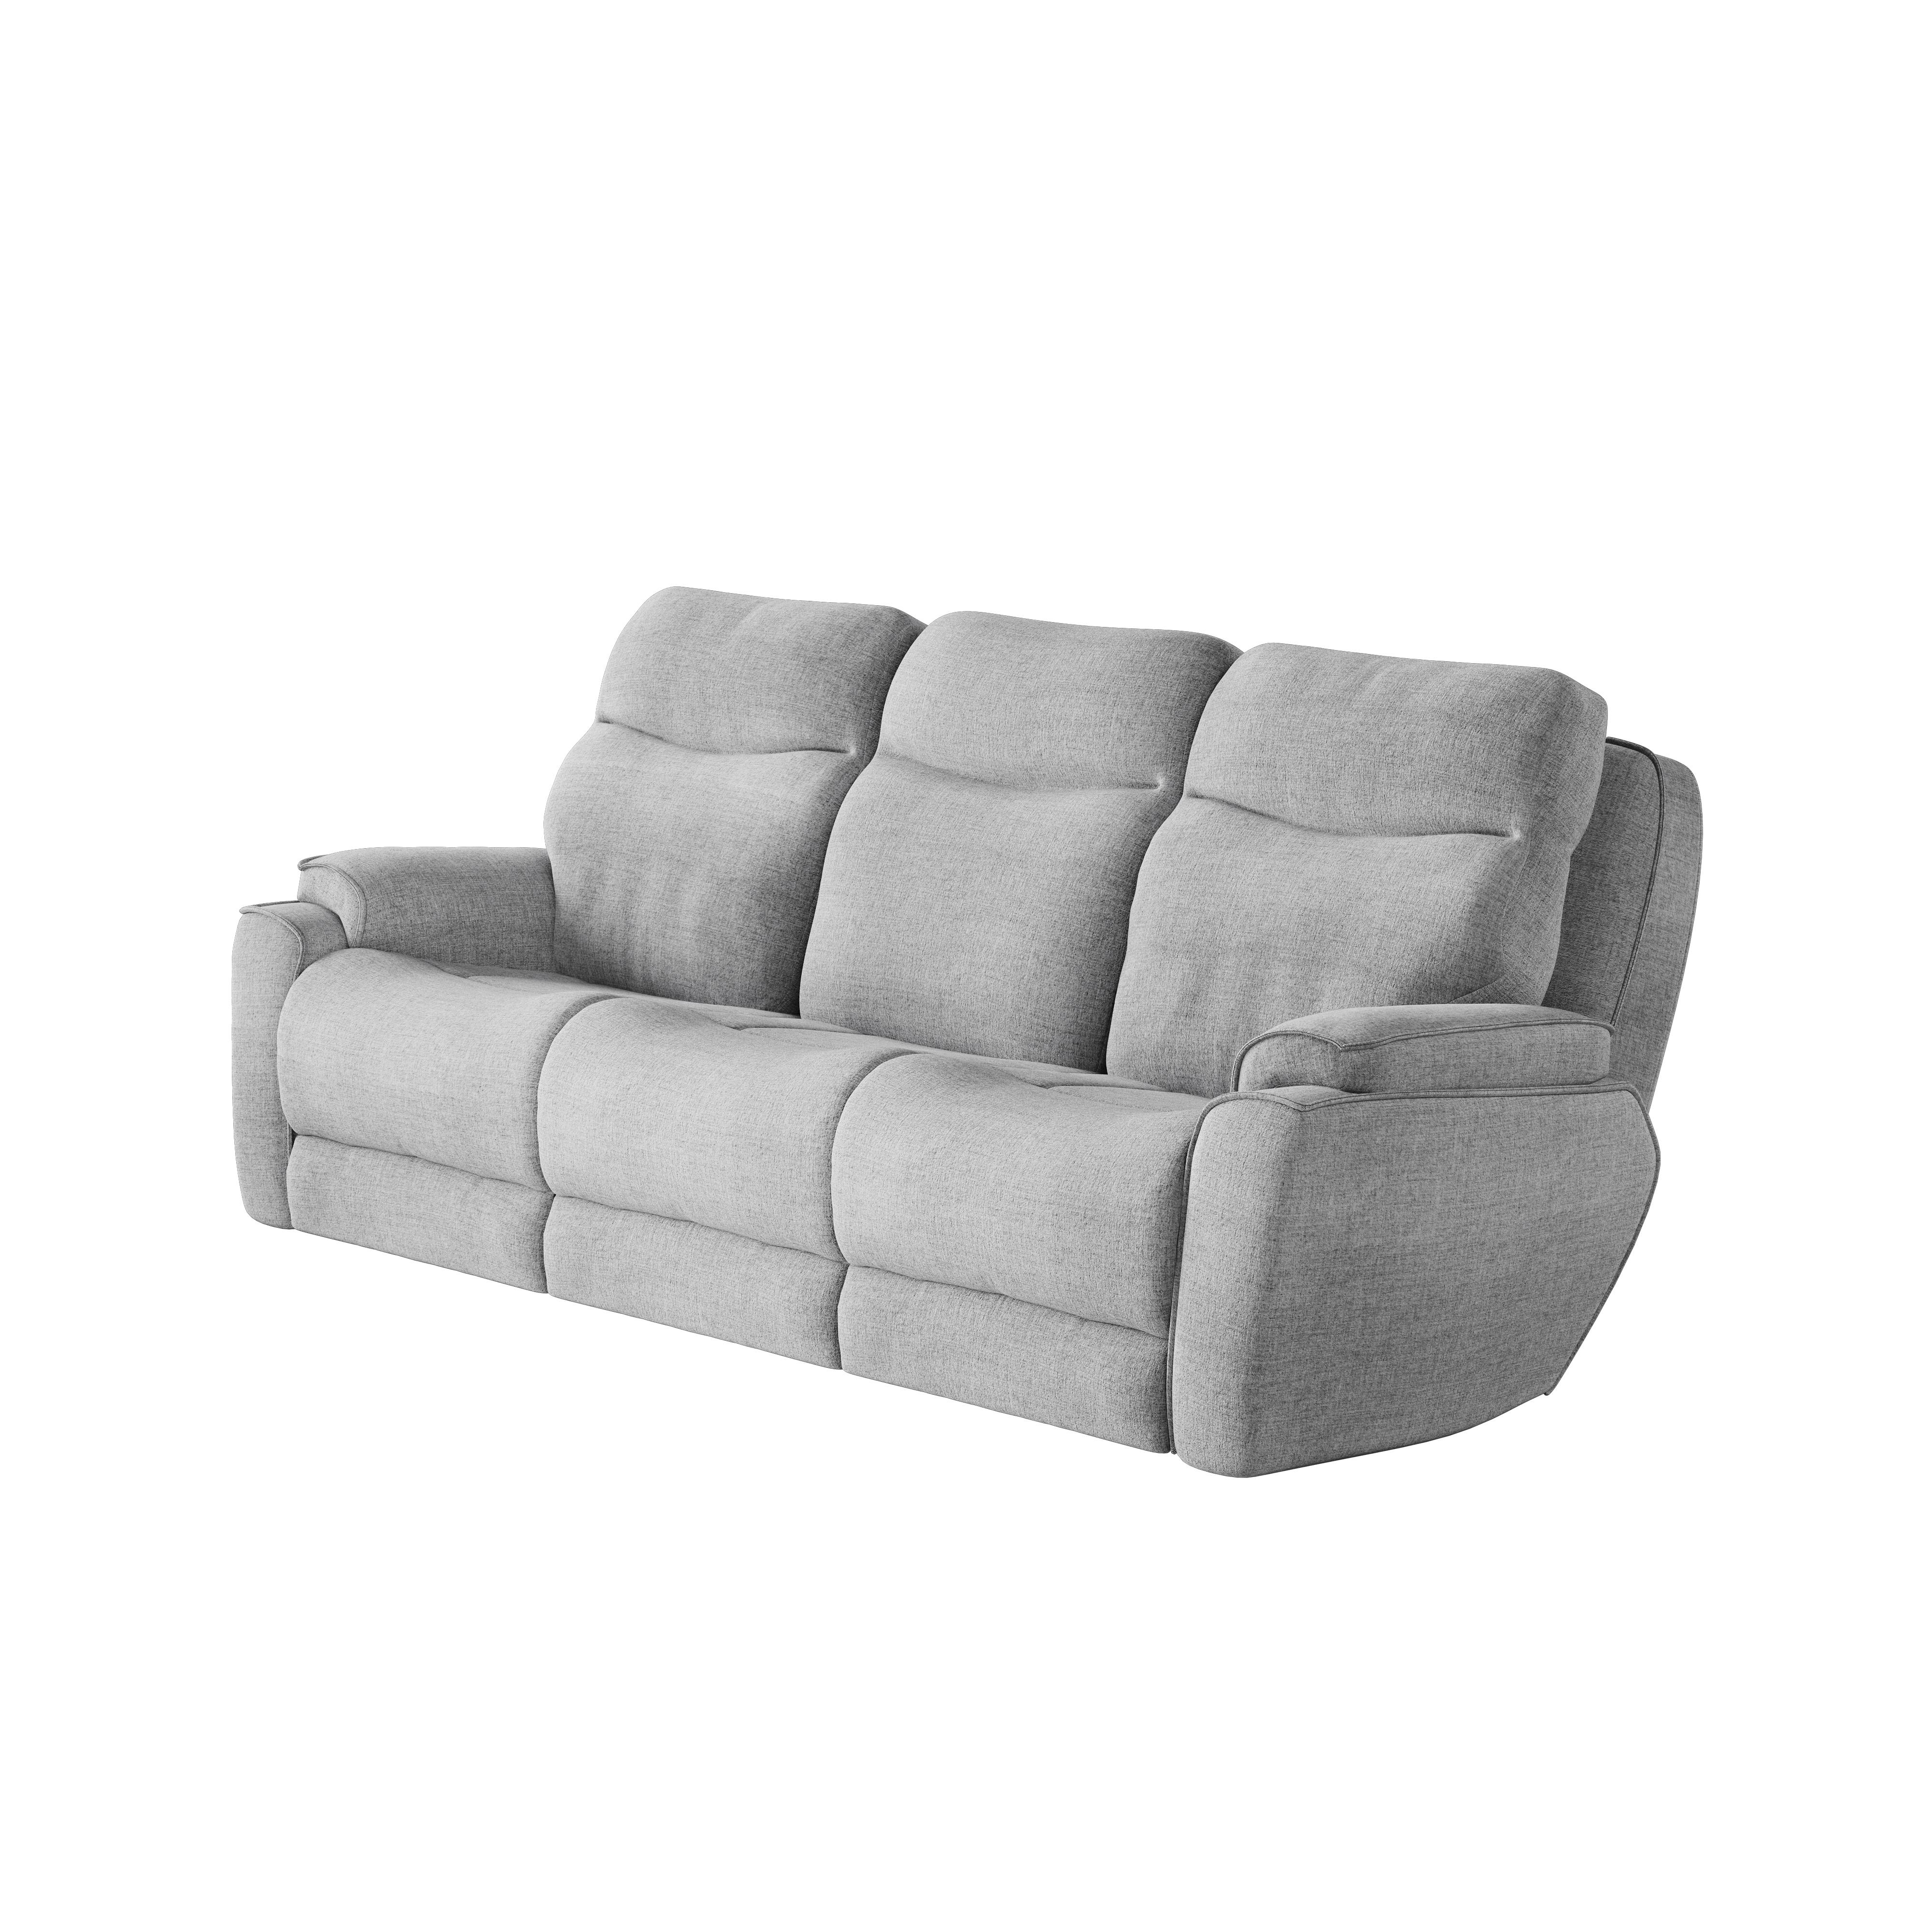 bahari-platinum-sofa